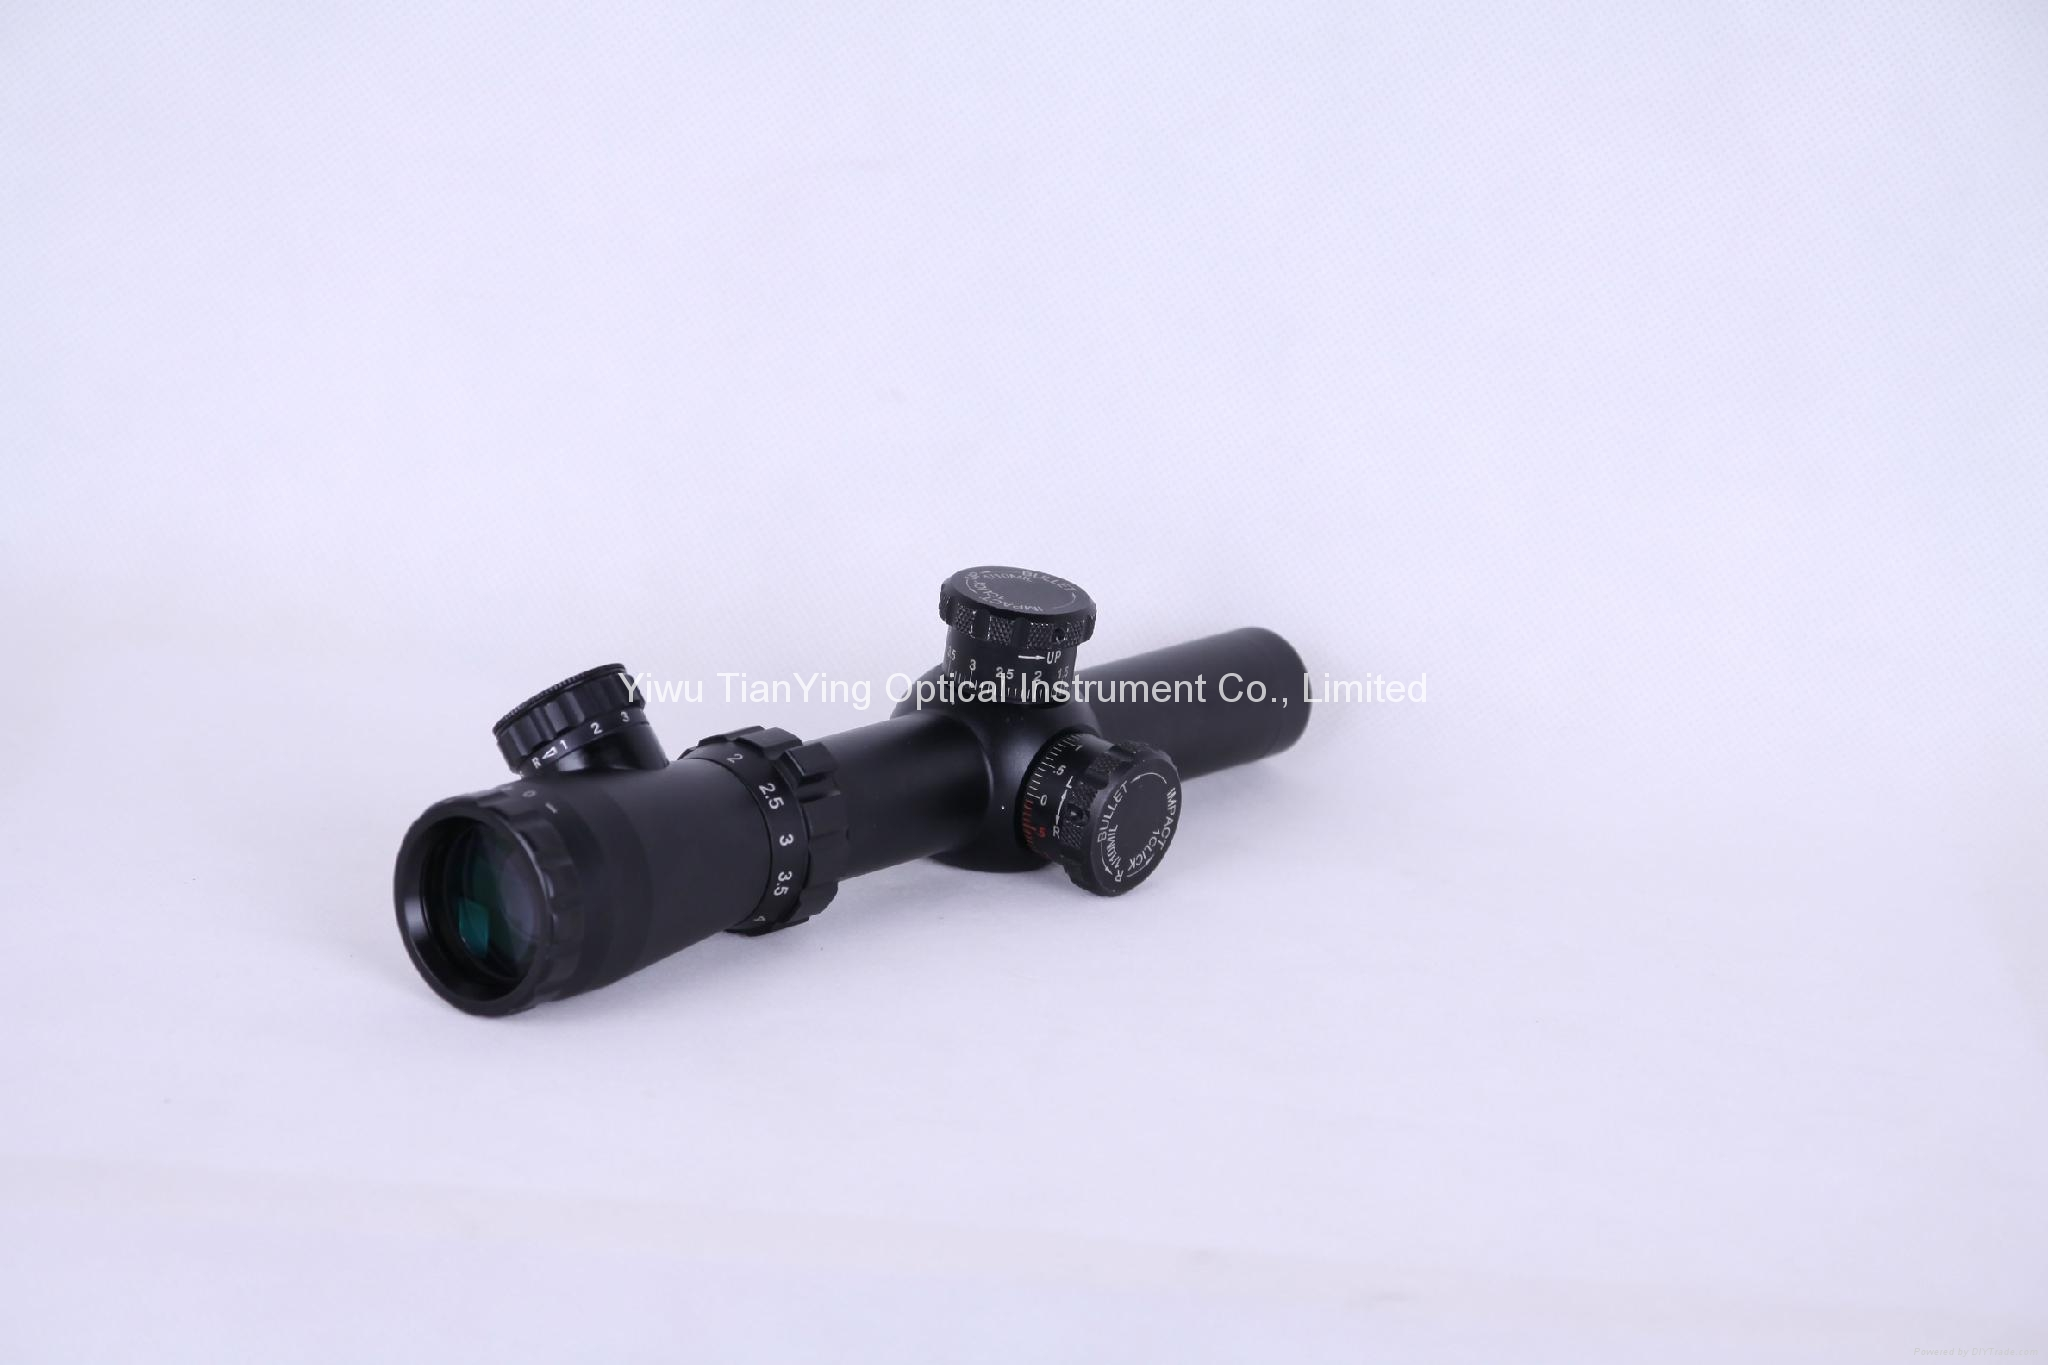 FT830 Fiber Optics Riflescope / Rifle Scope .223 Ballistic Reticle - M4/M16/AR15 -1